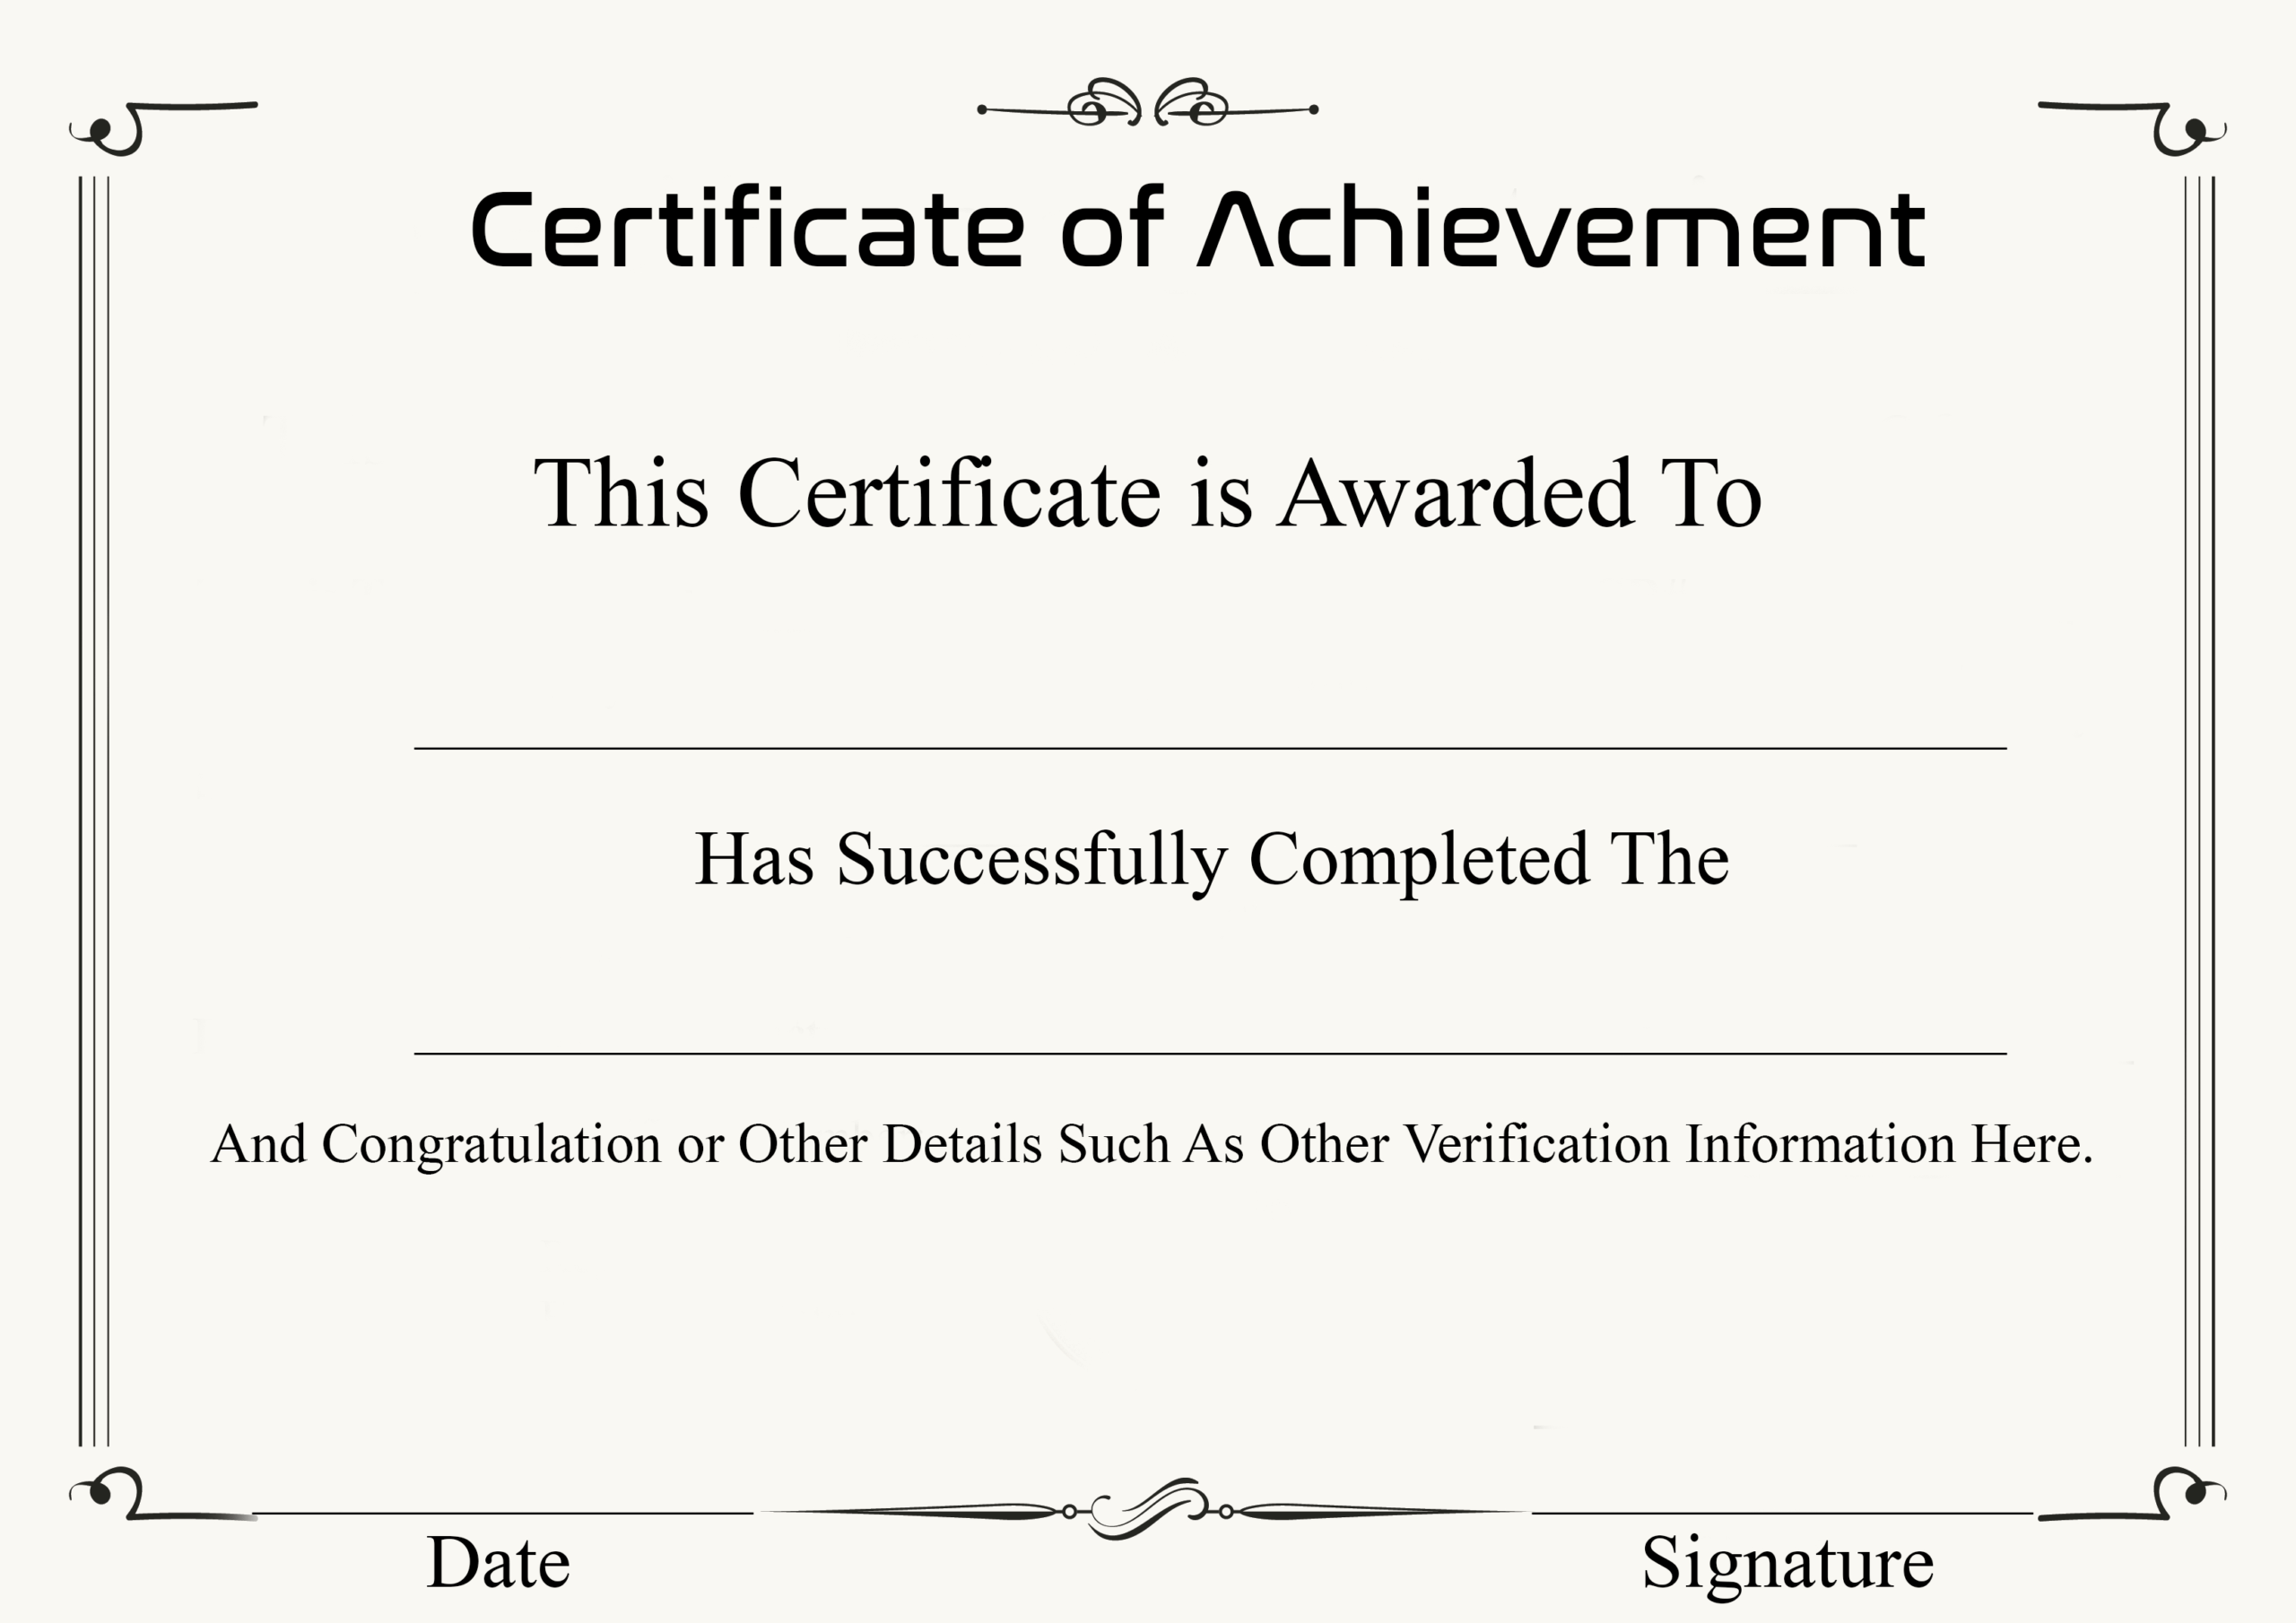 ❤️ Free Sample Certificate Of Achievement Template❤️ In Certificate Of Achievement Army Template